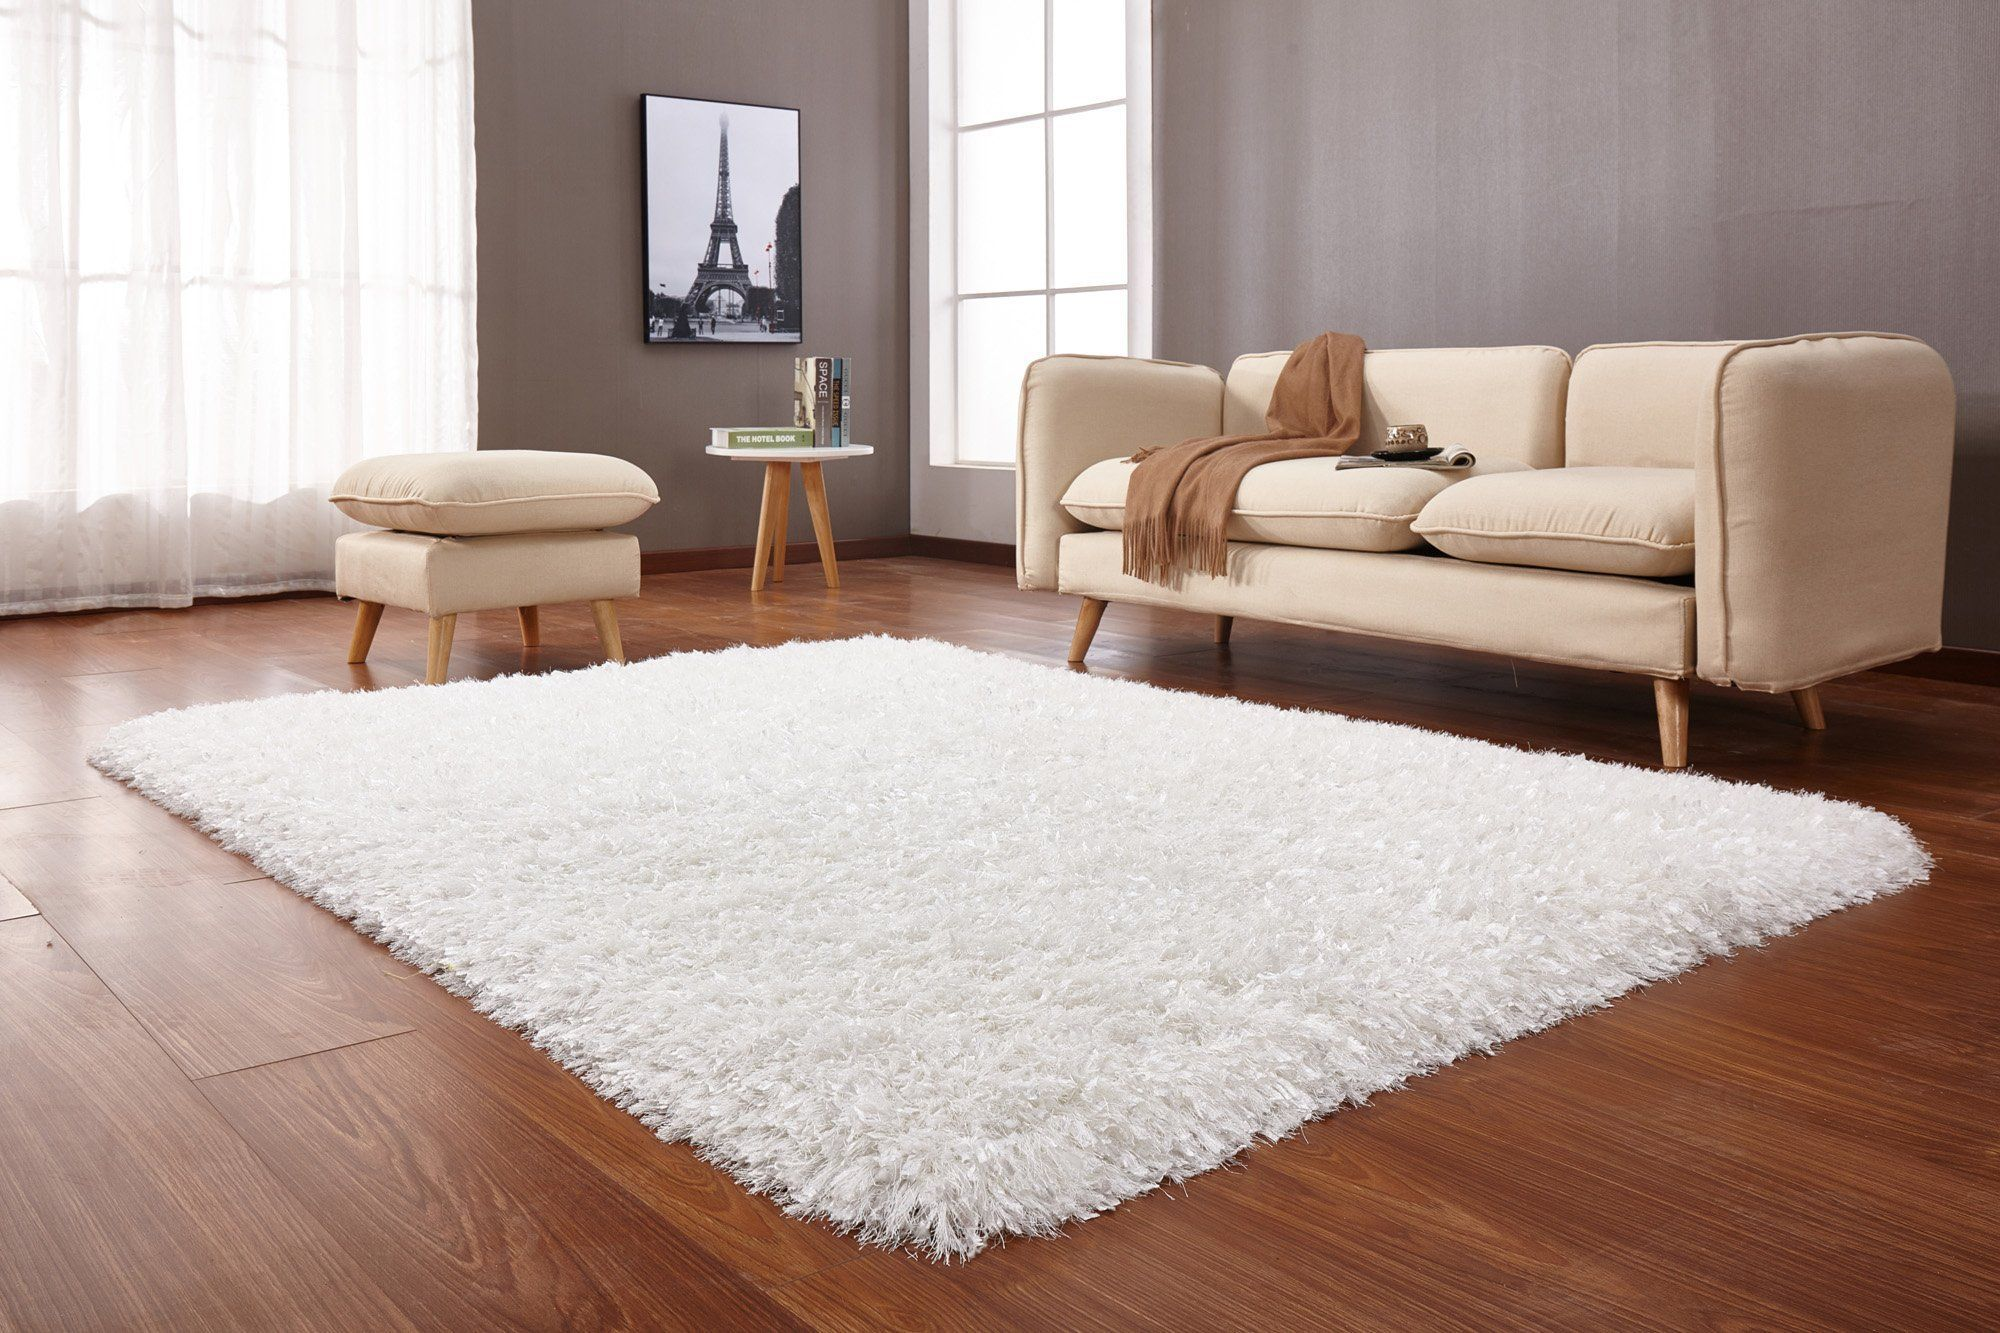 8 X 10 Large White Shag Rug Crystal White Shag Rug Shag Rug Rugs On Carpet Large white area rug